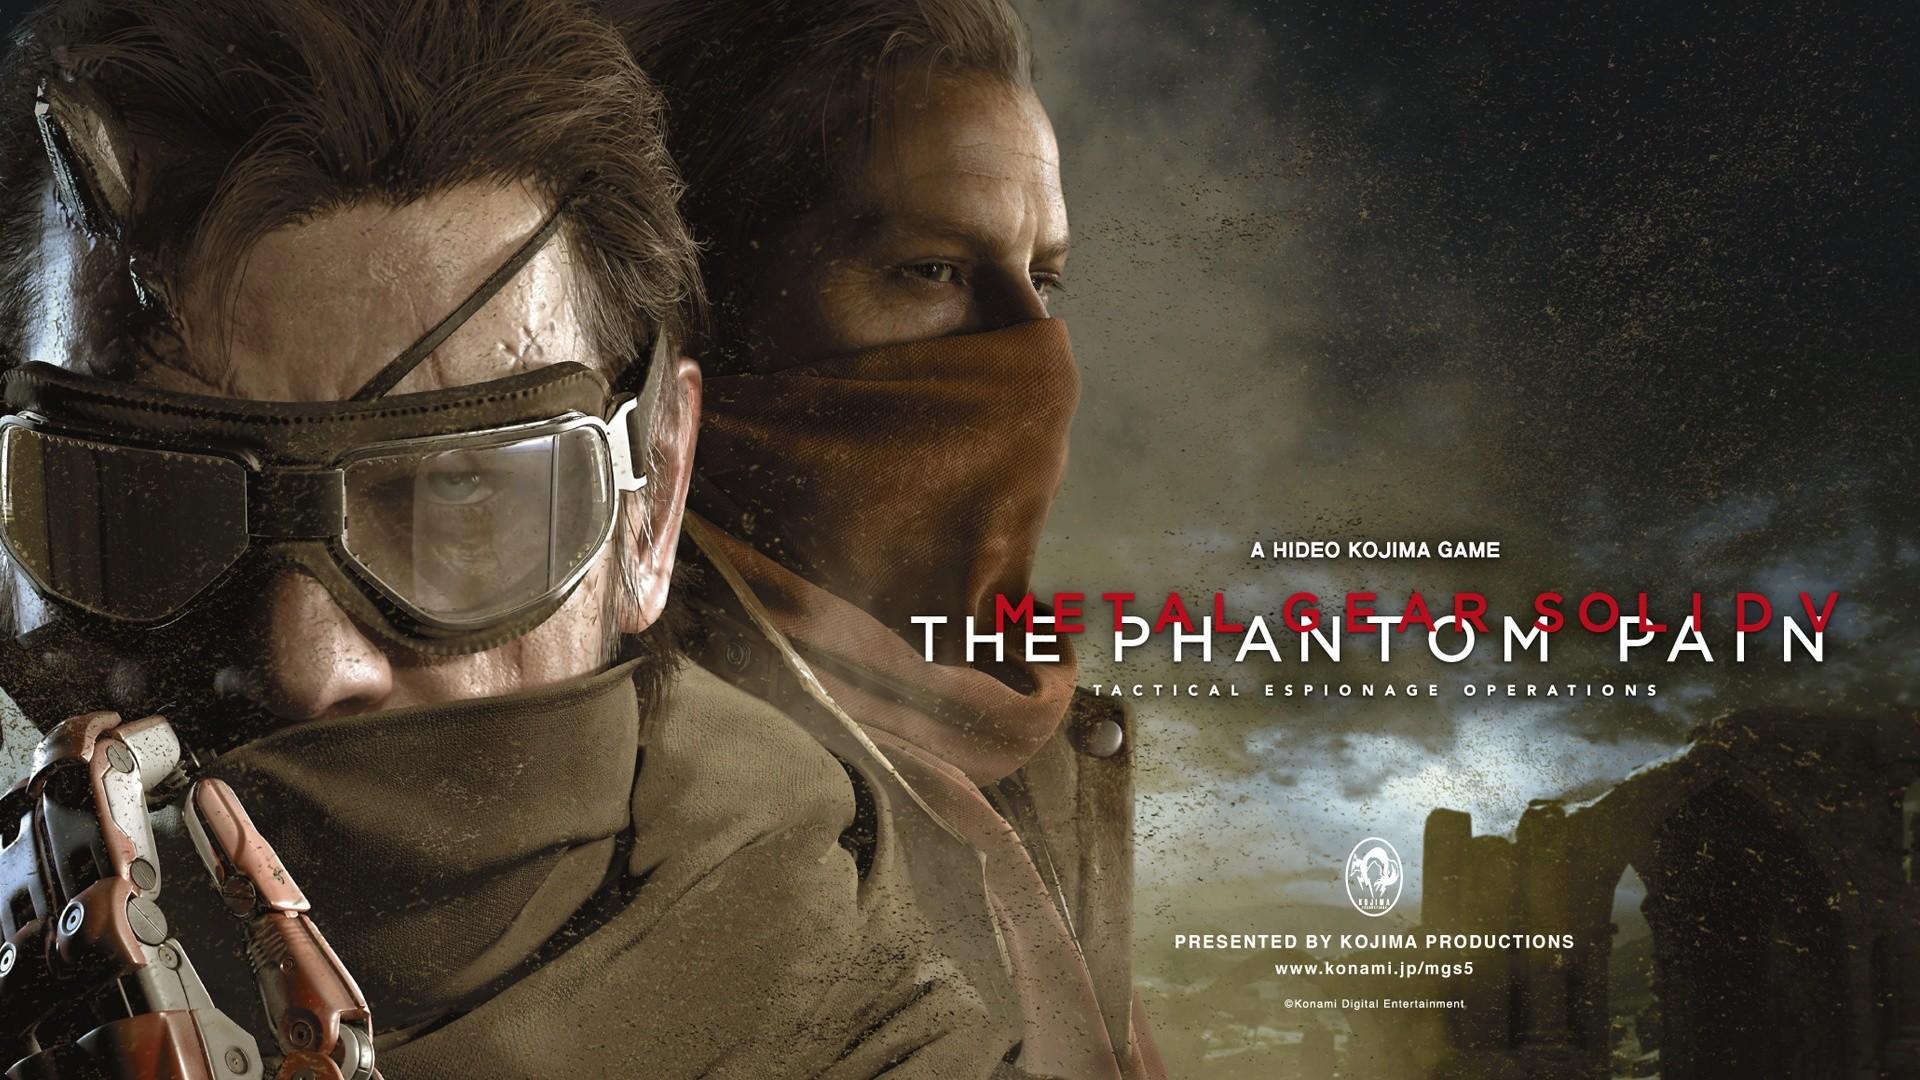 Metal Gear Solid V: The Phantom Pain download wallpaper